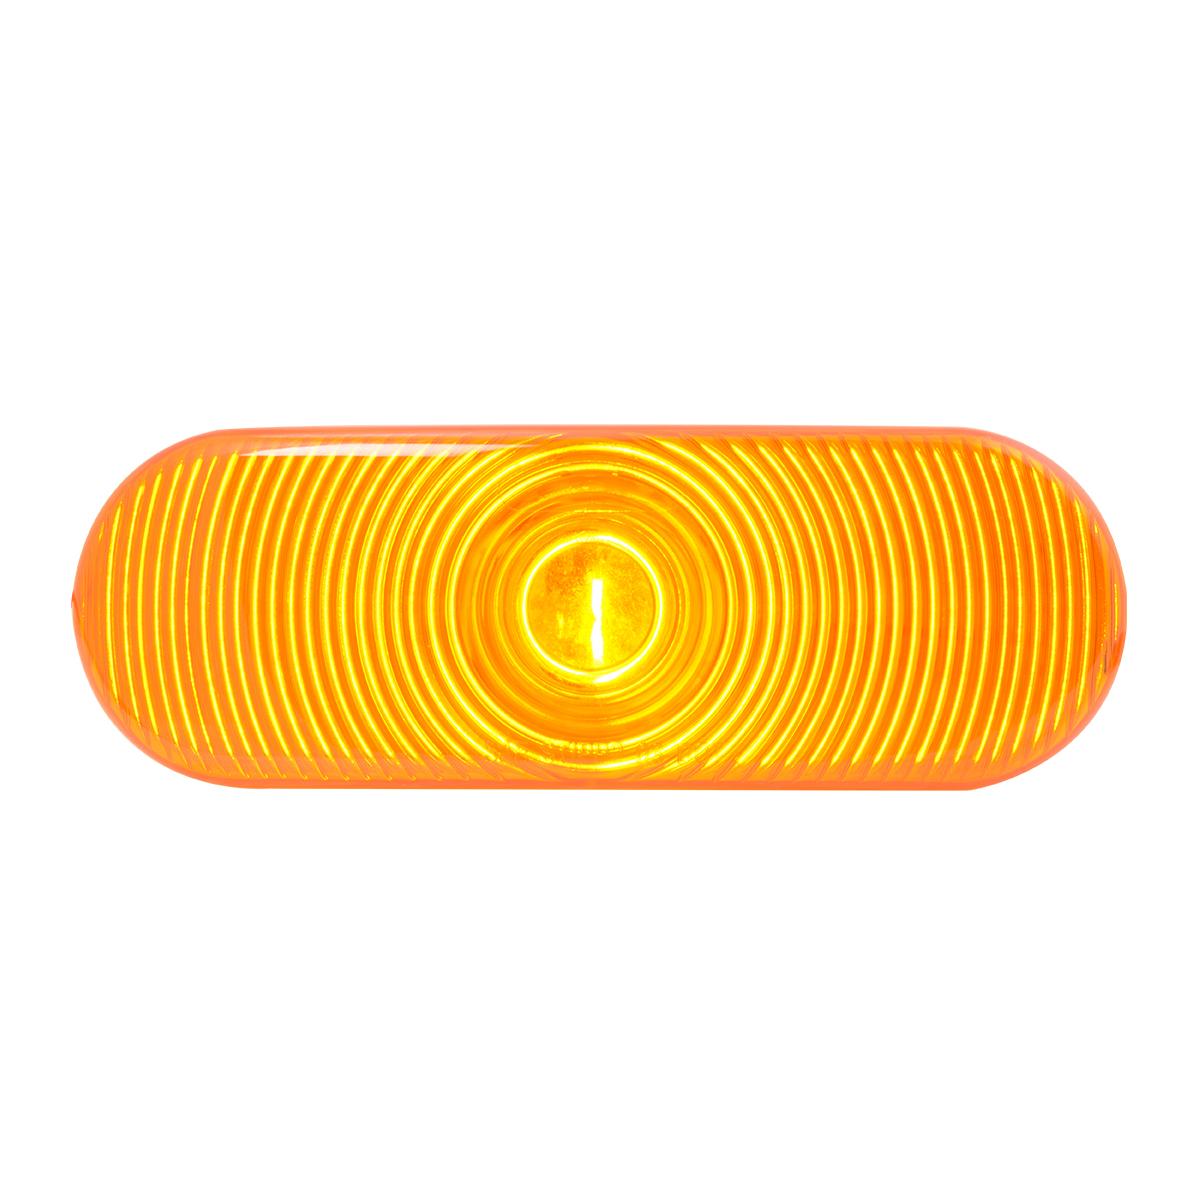 #80800 Incandescent Flat Oval Sealed Light - Amber/Amber